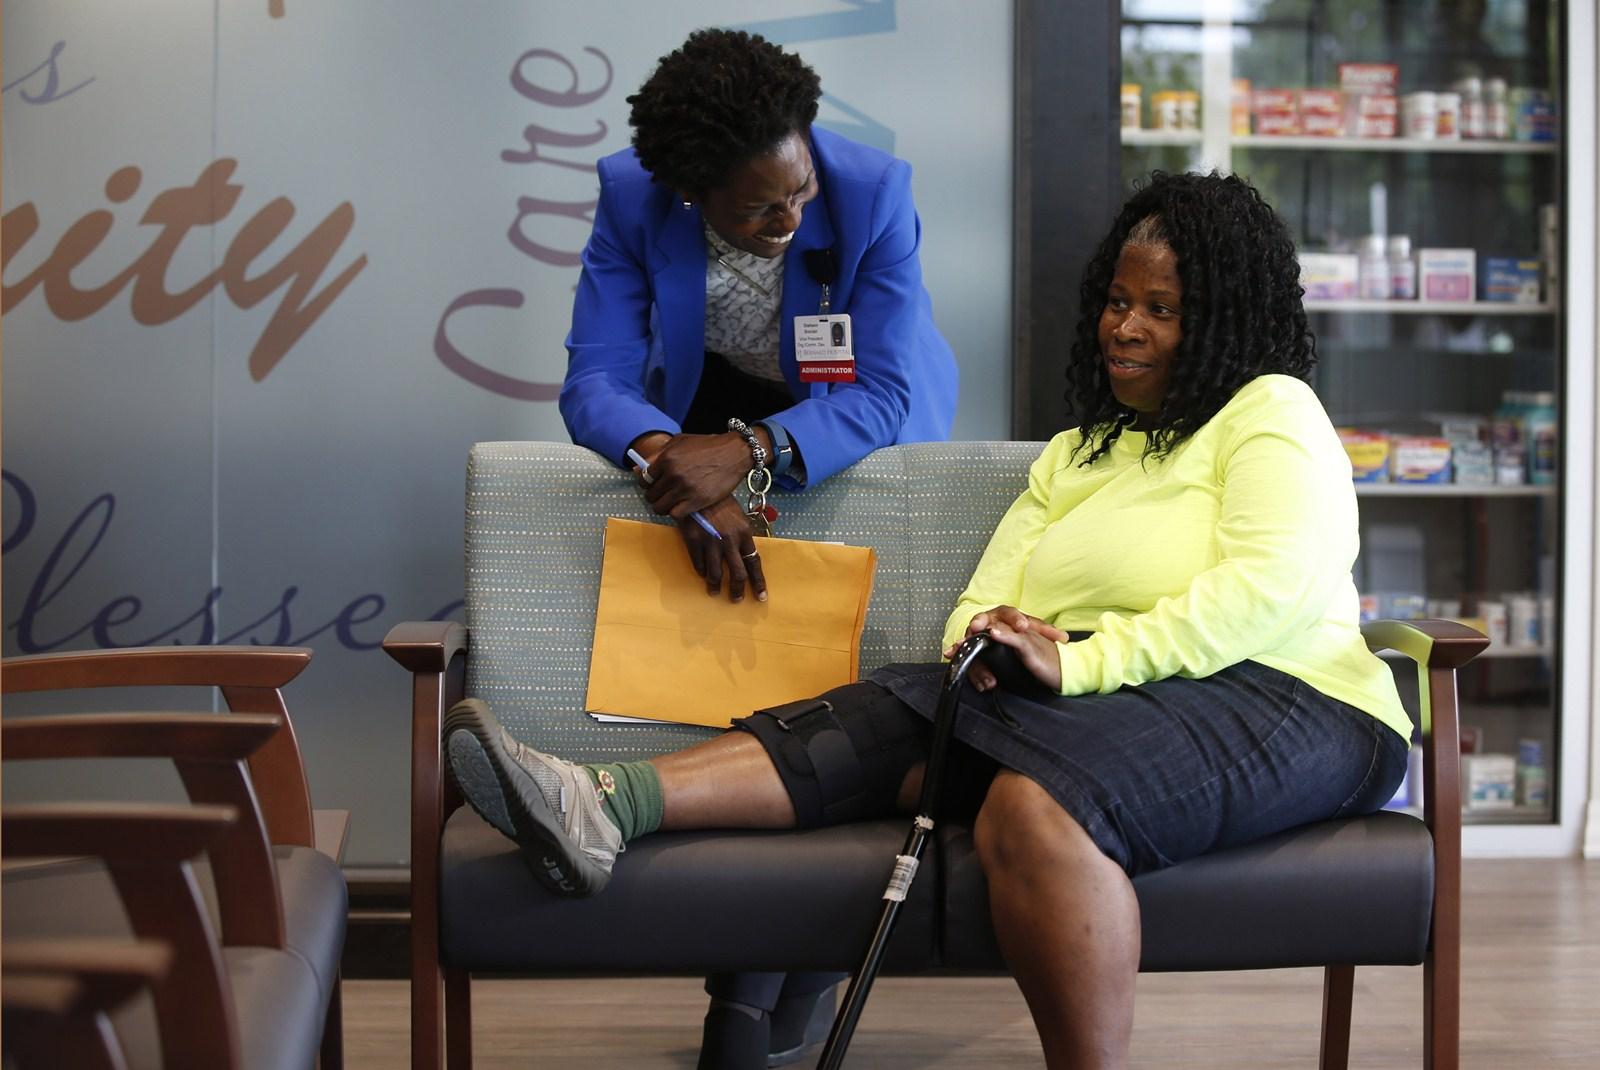 6444fb6177 Deirdra Jordan, seated, chats with St. Bernard executive Diahann Sinclair.  Jordan gets therapy for an injured knee. (Phil Velasquez/Chicago Tribune)